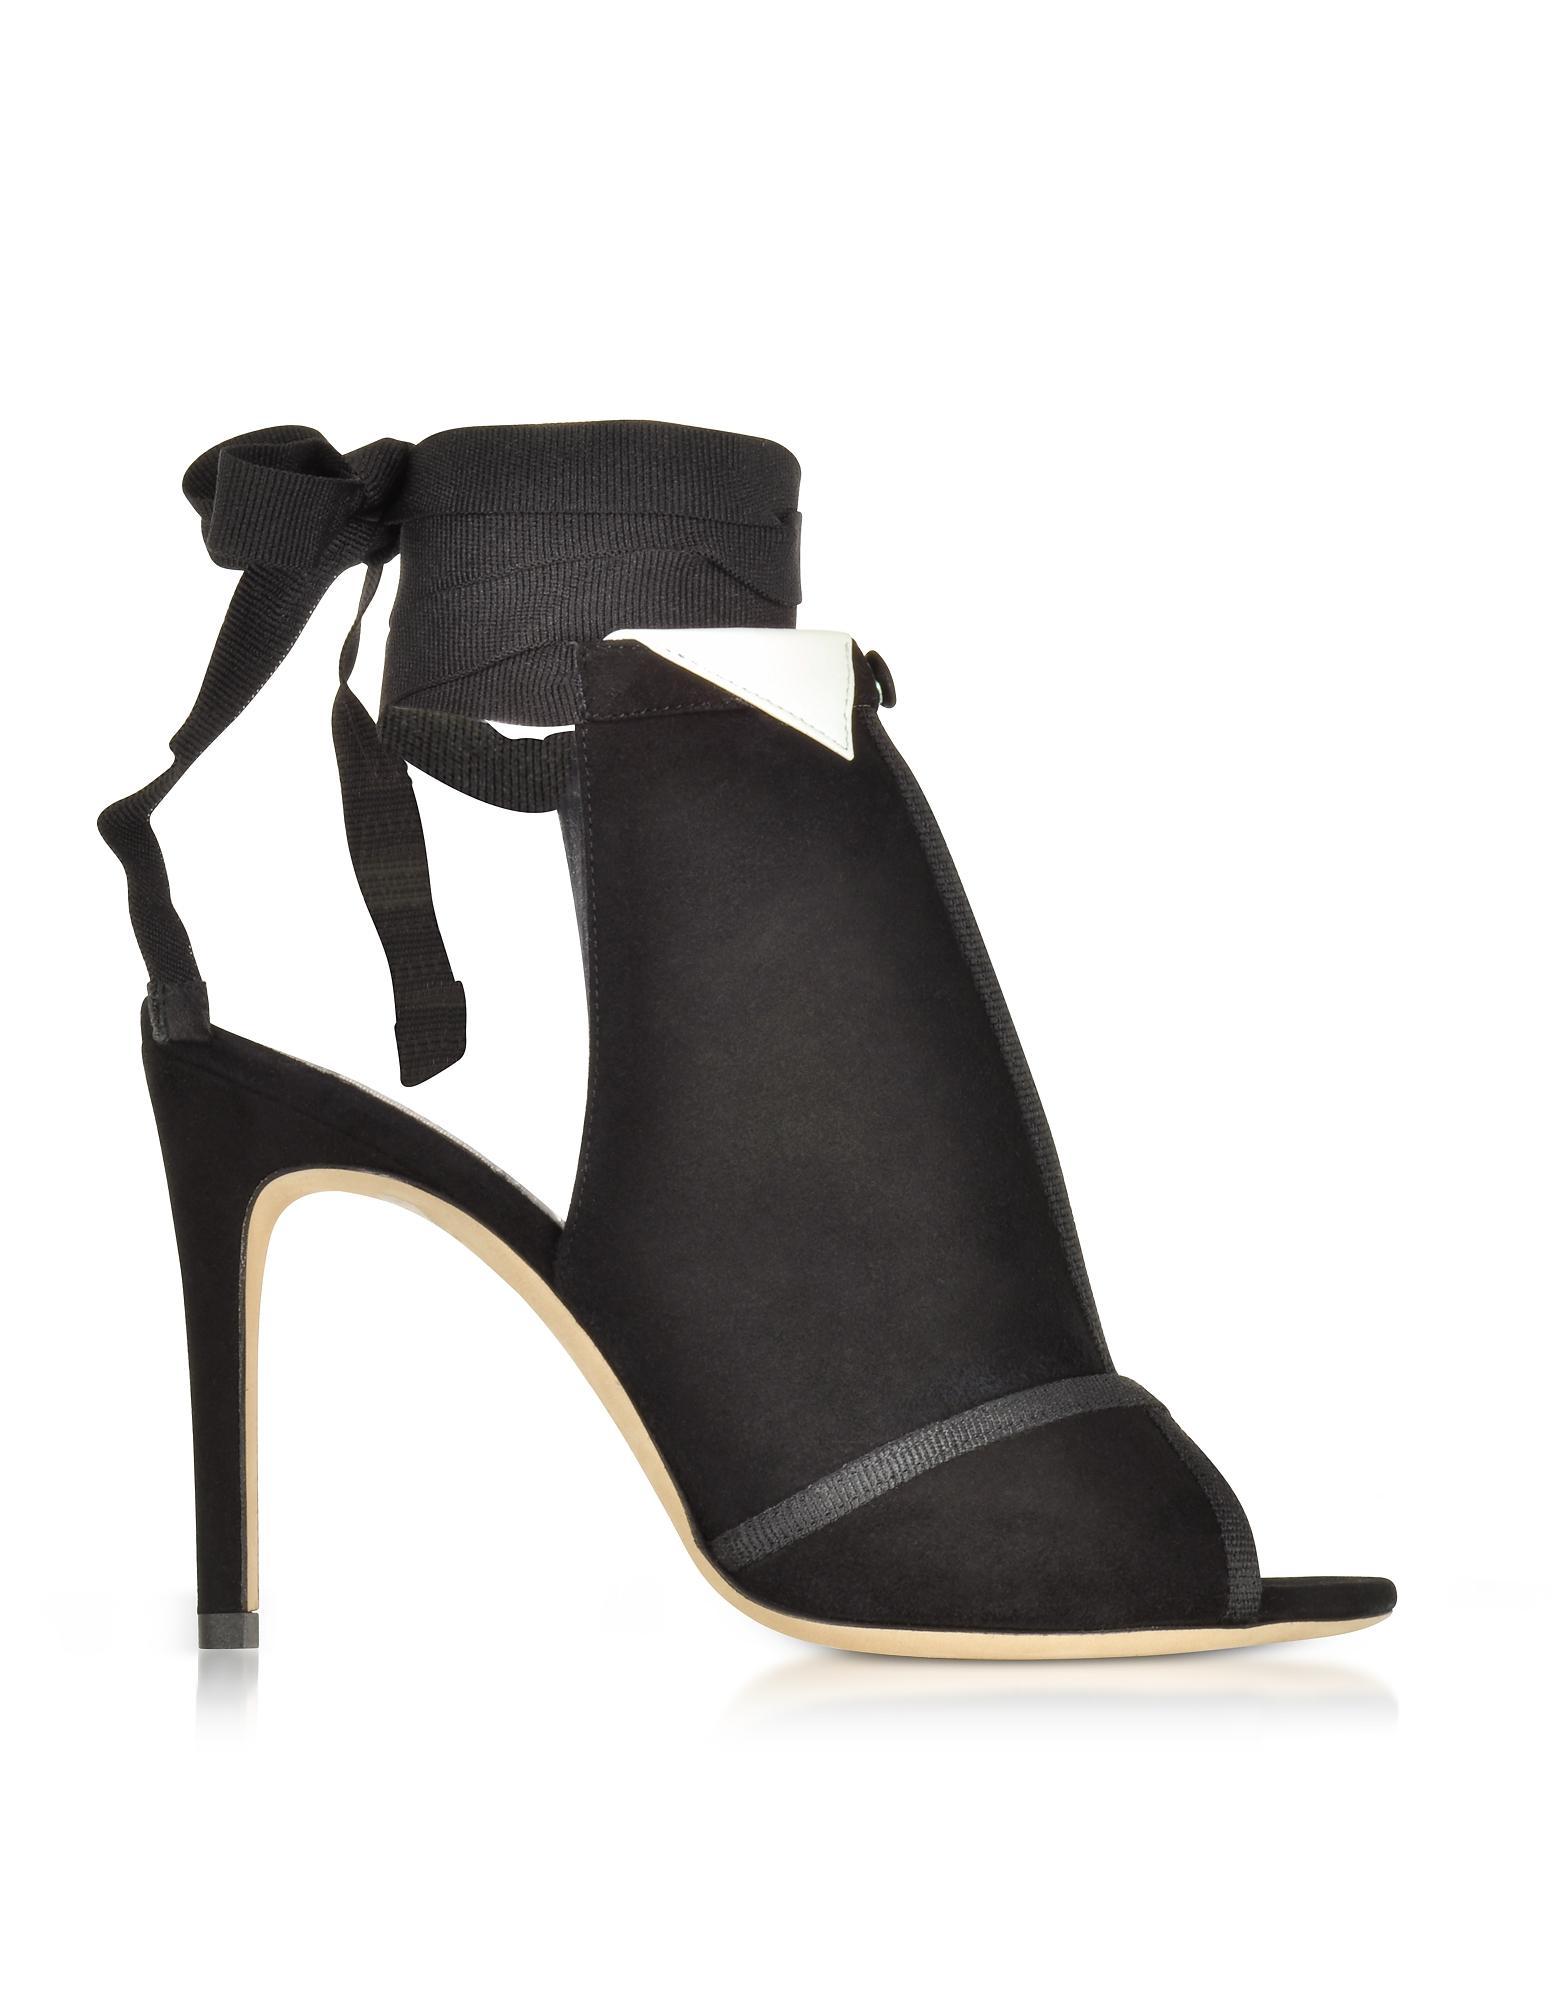 e07e84a73a9 Lyst - Olgana Paris La Jolie Black Suede High Heel Pump in Black